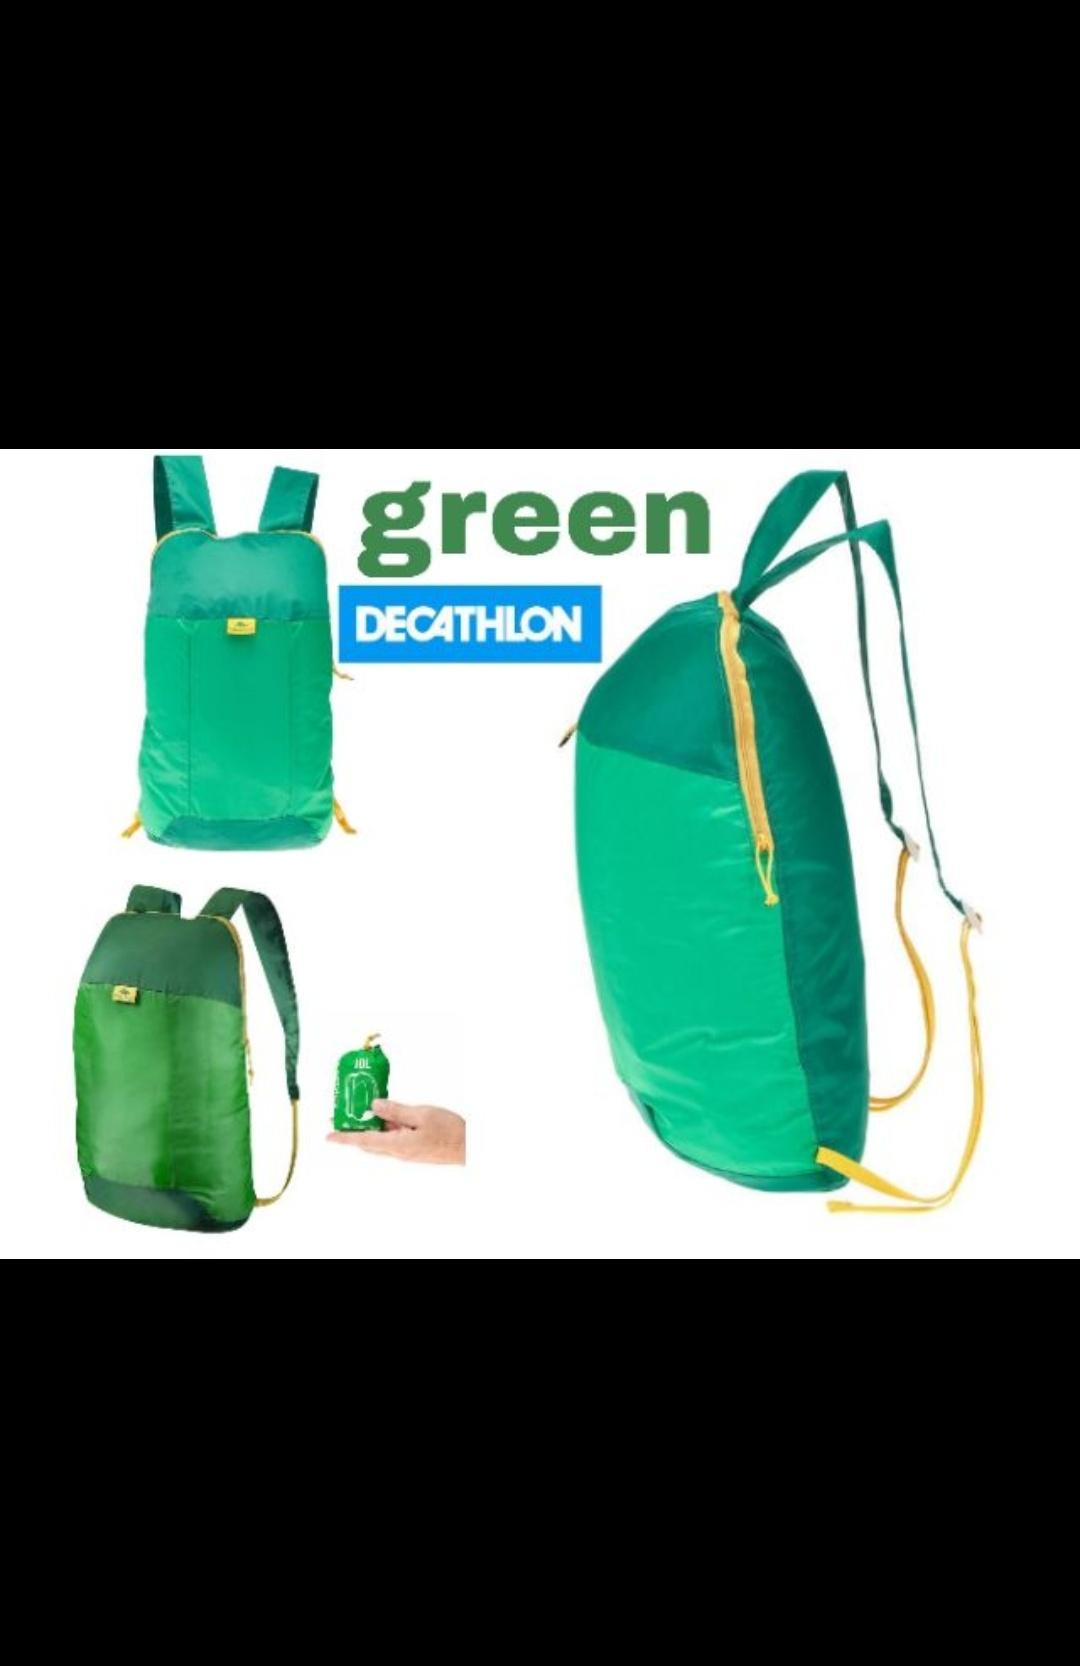 275ba7fe8ff Decathlon Philippines: Decathlon price list - Sports Bag, Shoes, Cap ...